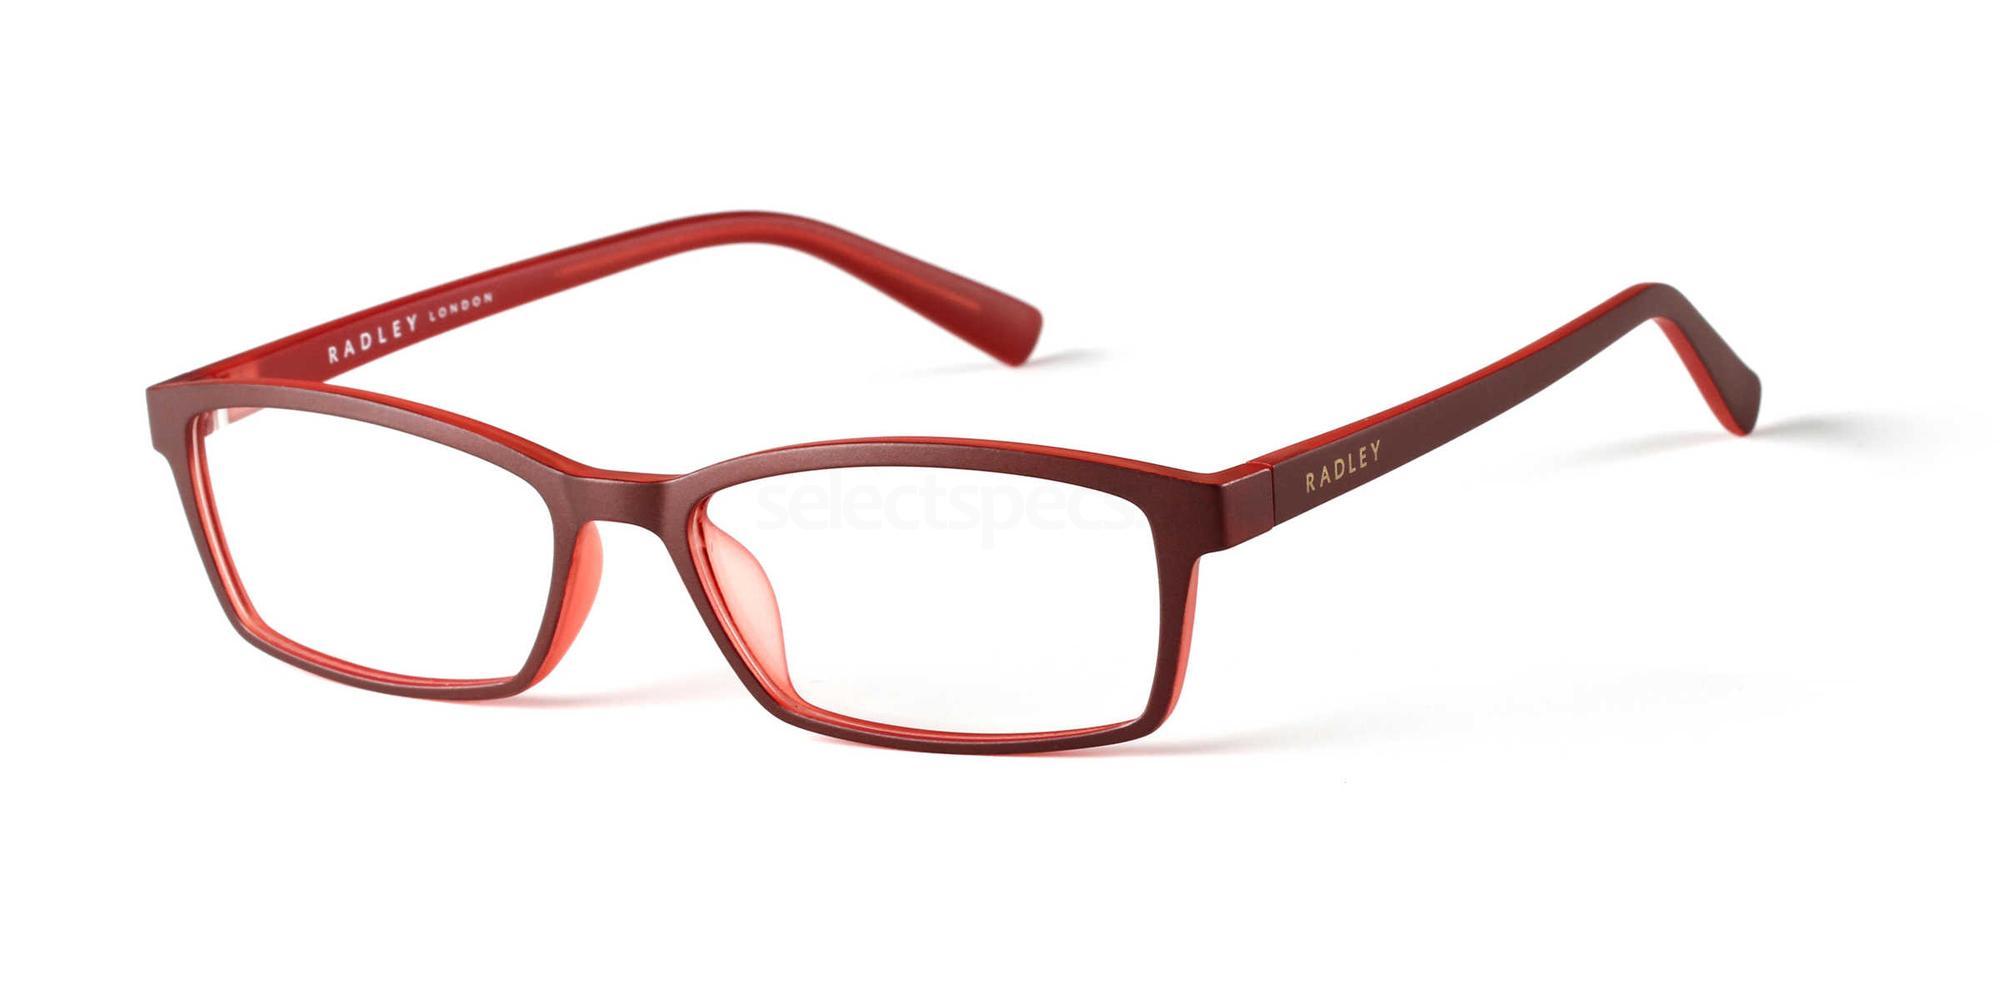 101 RDO-15505 Glasses, Radley London